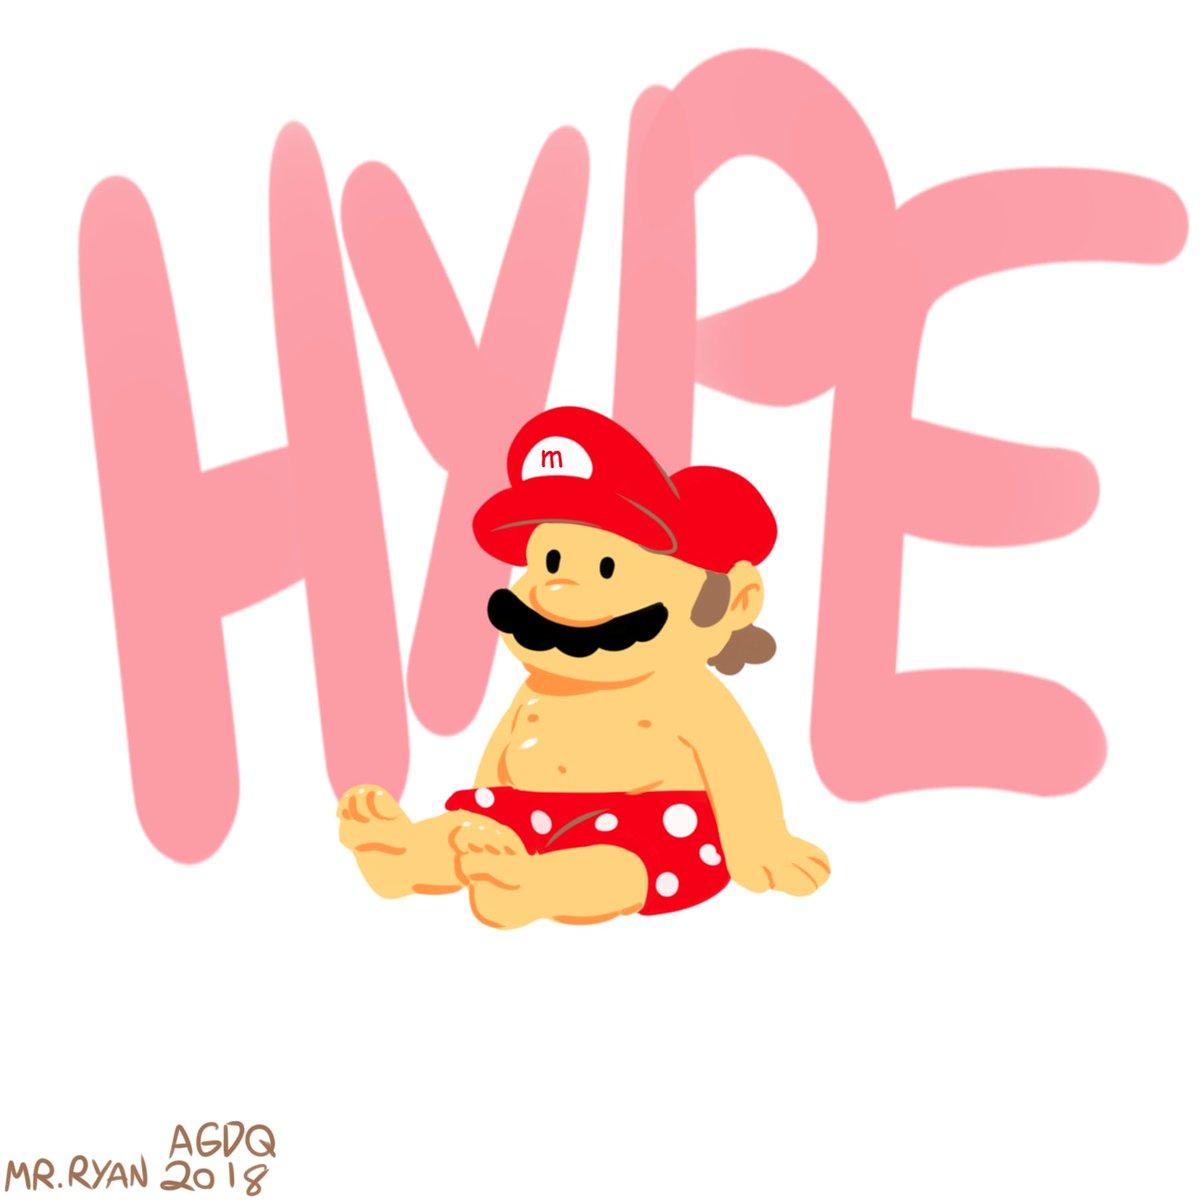 bring on that good good odyssey run #GamesDrawnQuick #MarioOdyssey #AGDQ2019 @GamesDoneQuick<br>http://pic.twitter.com/s0o4LgVgDv